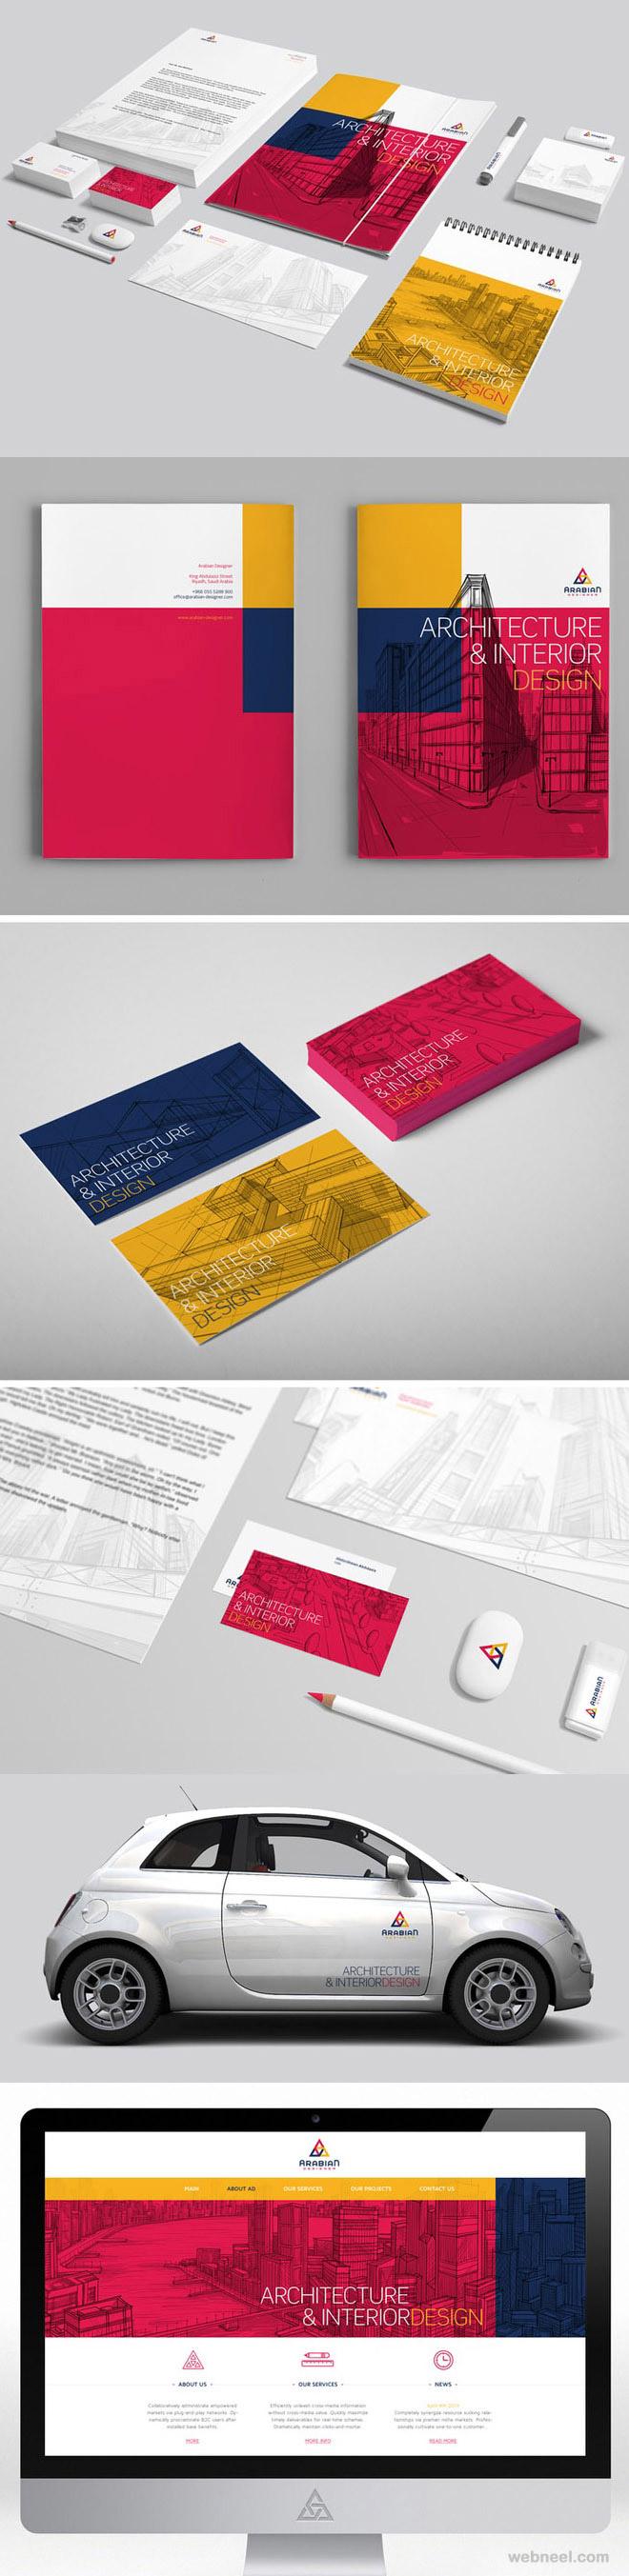 architecture interior branding identity design